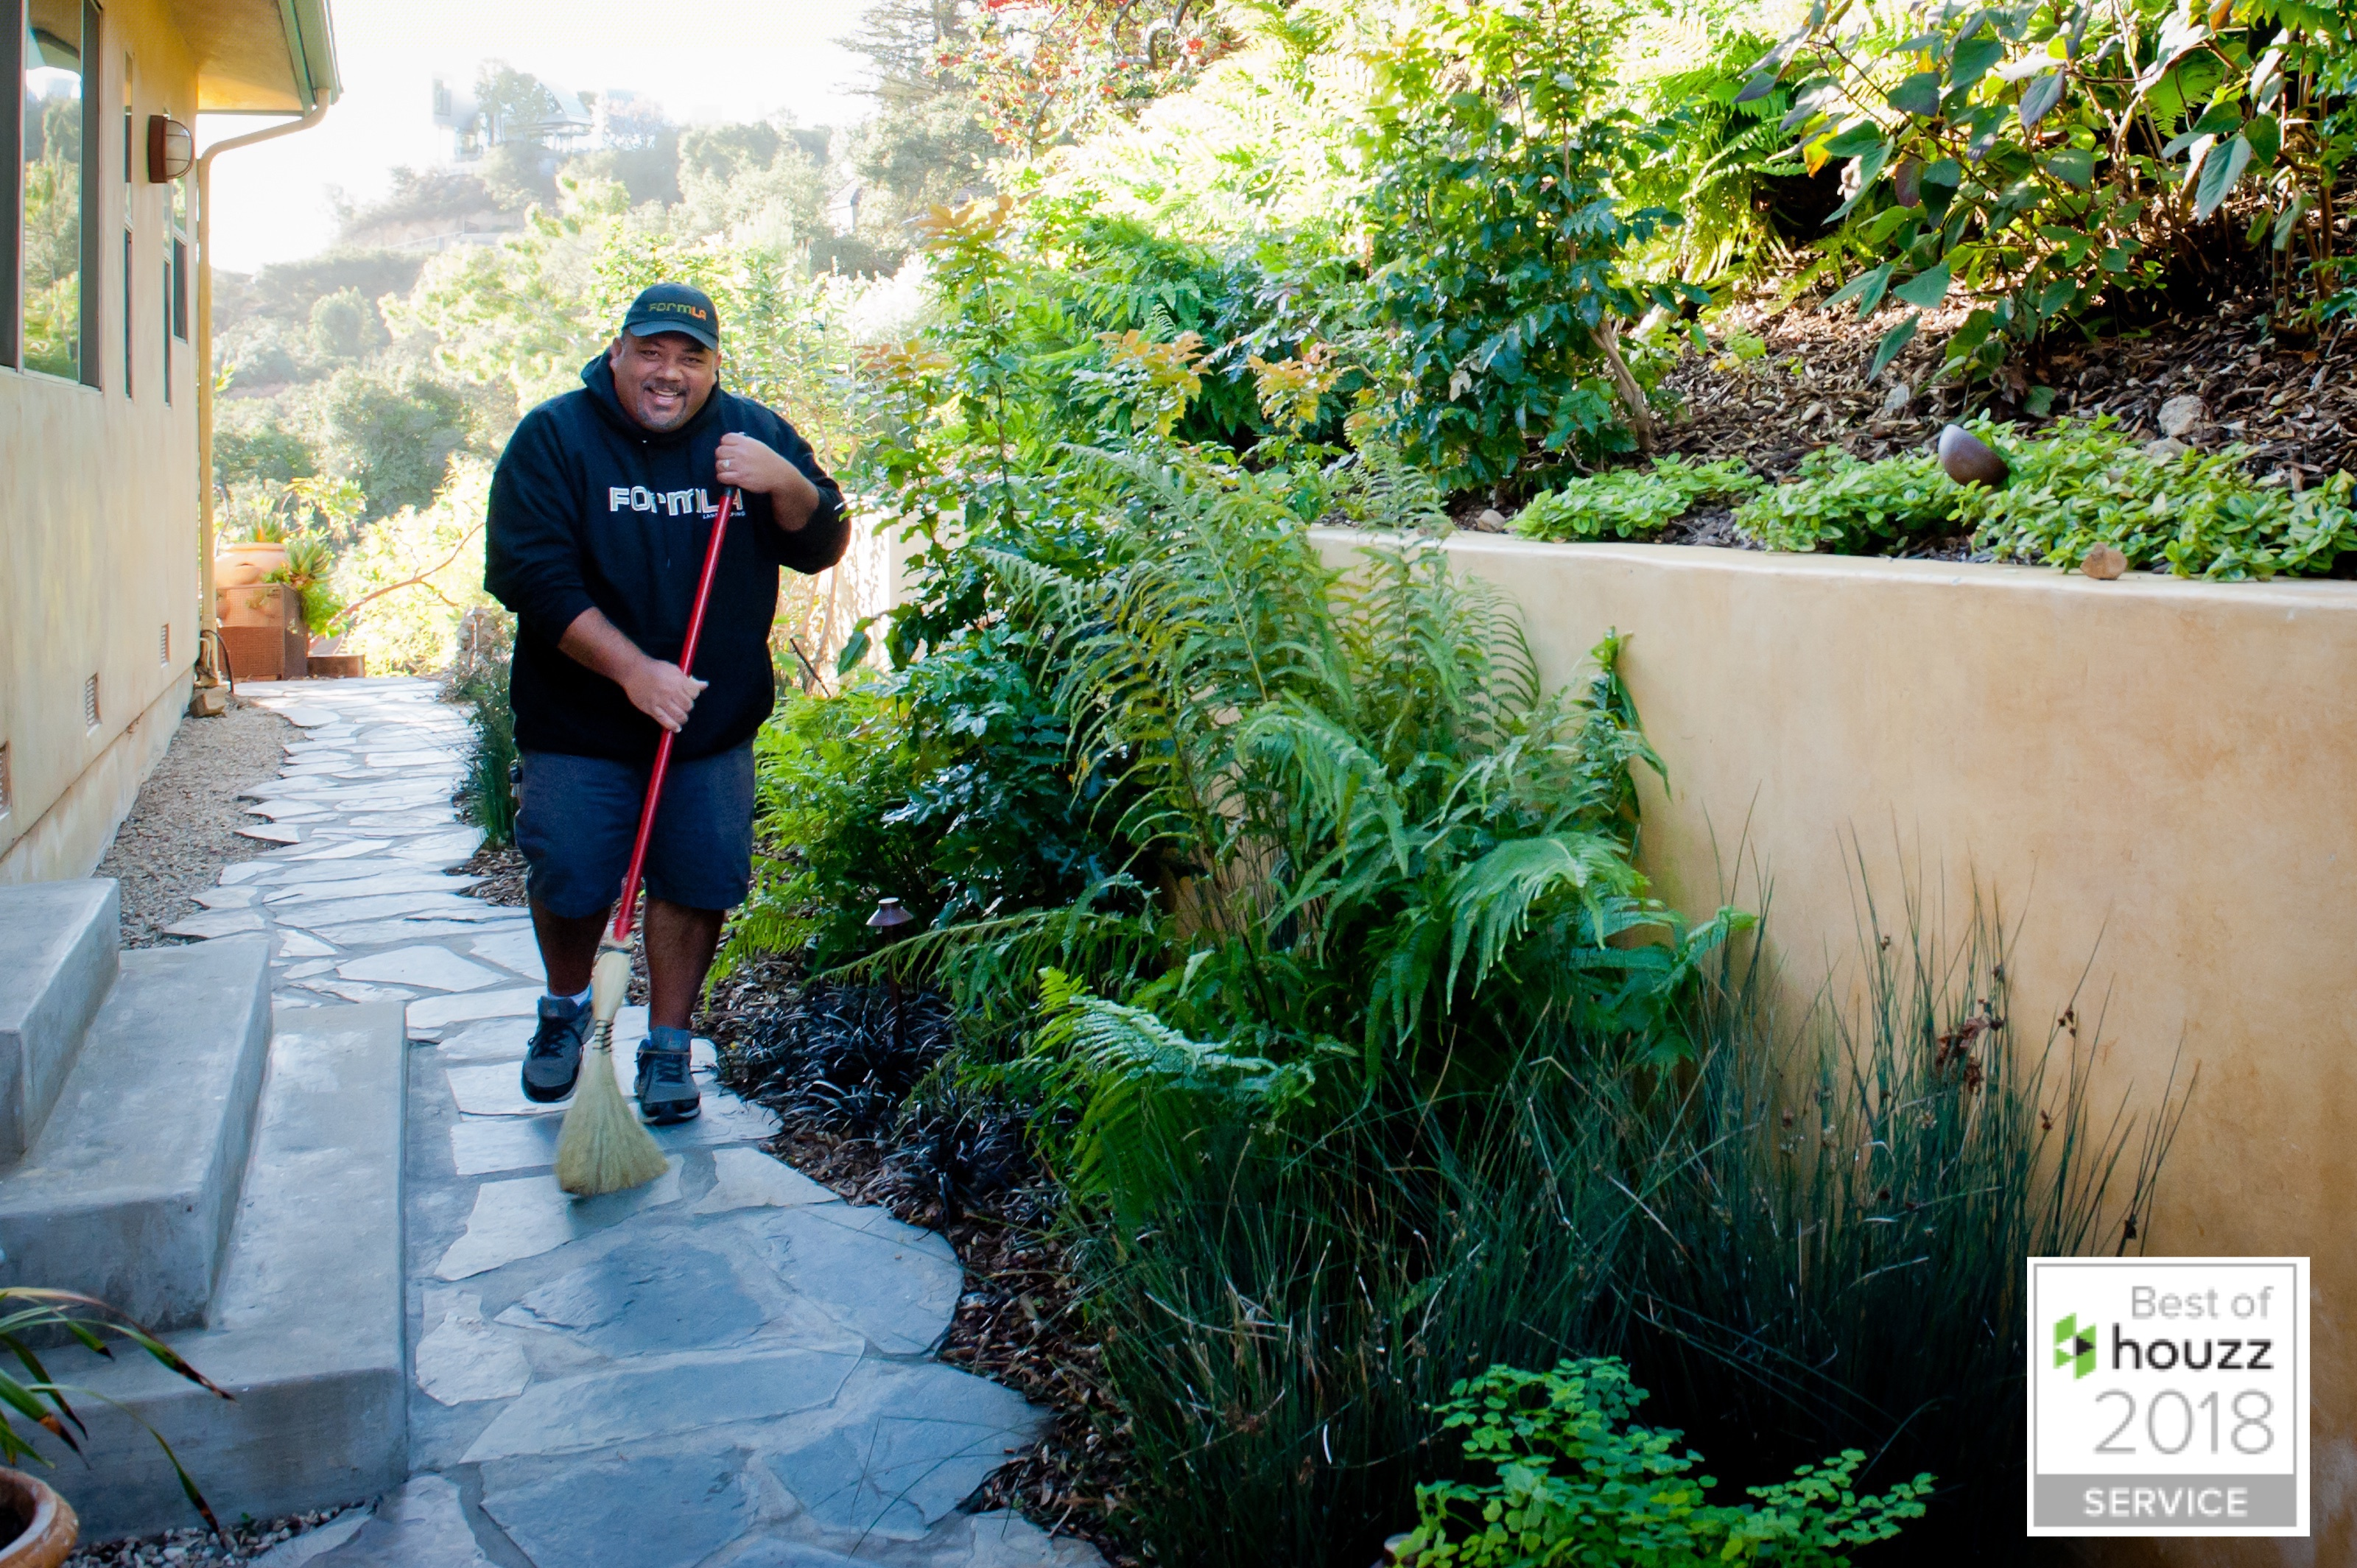 Oscar Ortega Maintenance Formla Landscaping